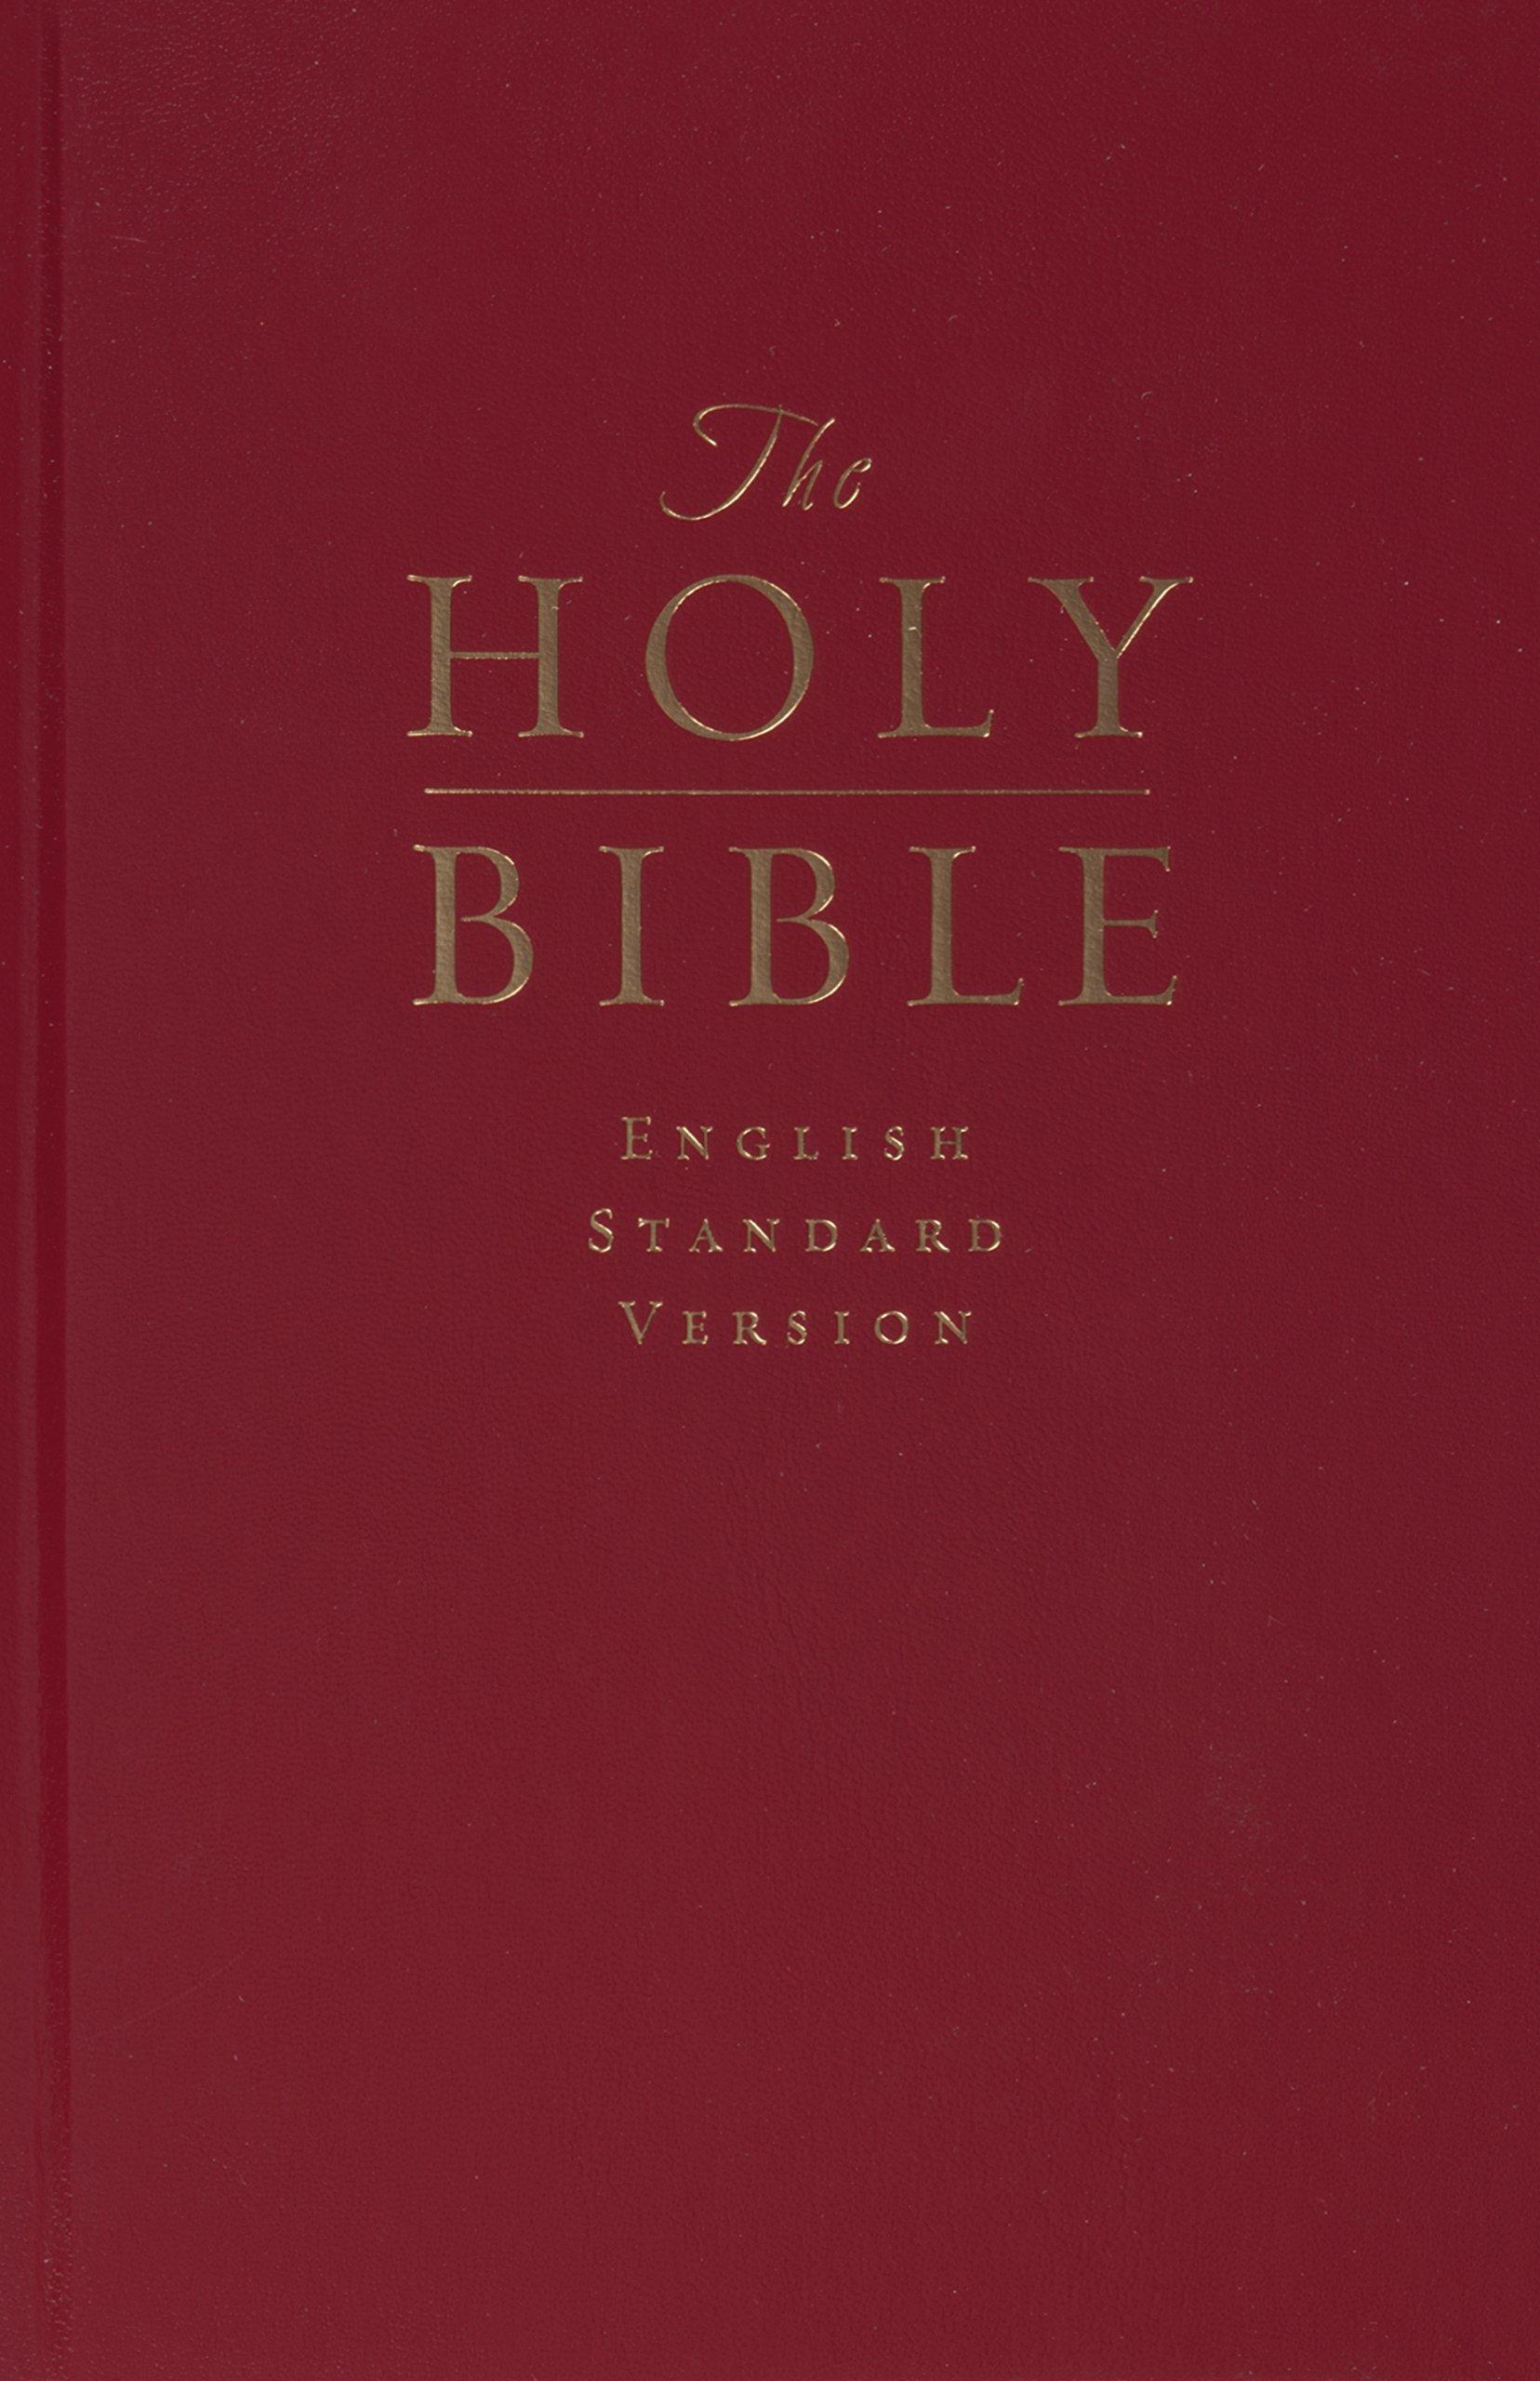 Download The Holy Bible: English Standard Version (Pew and Worship Bible, Dark Red) PDF